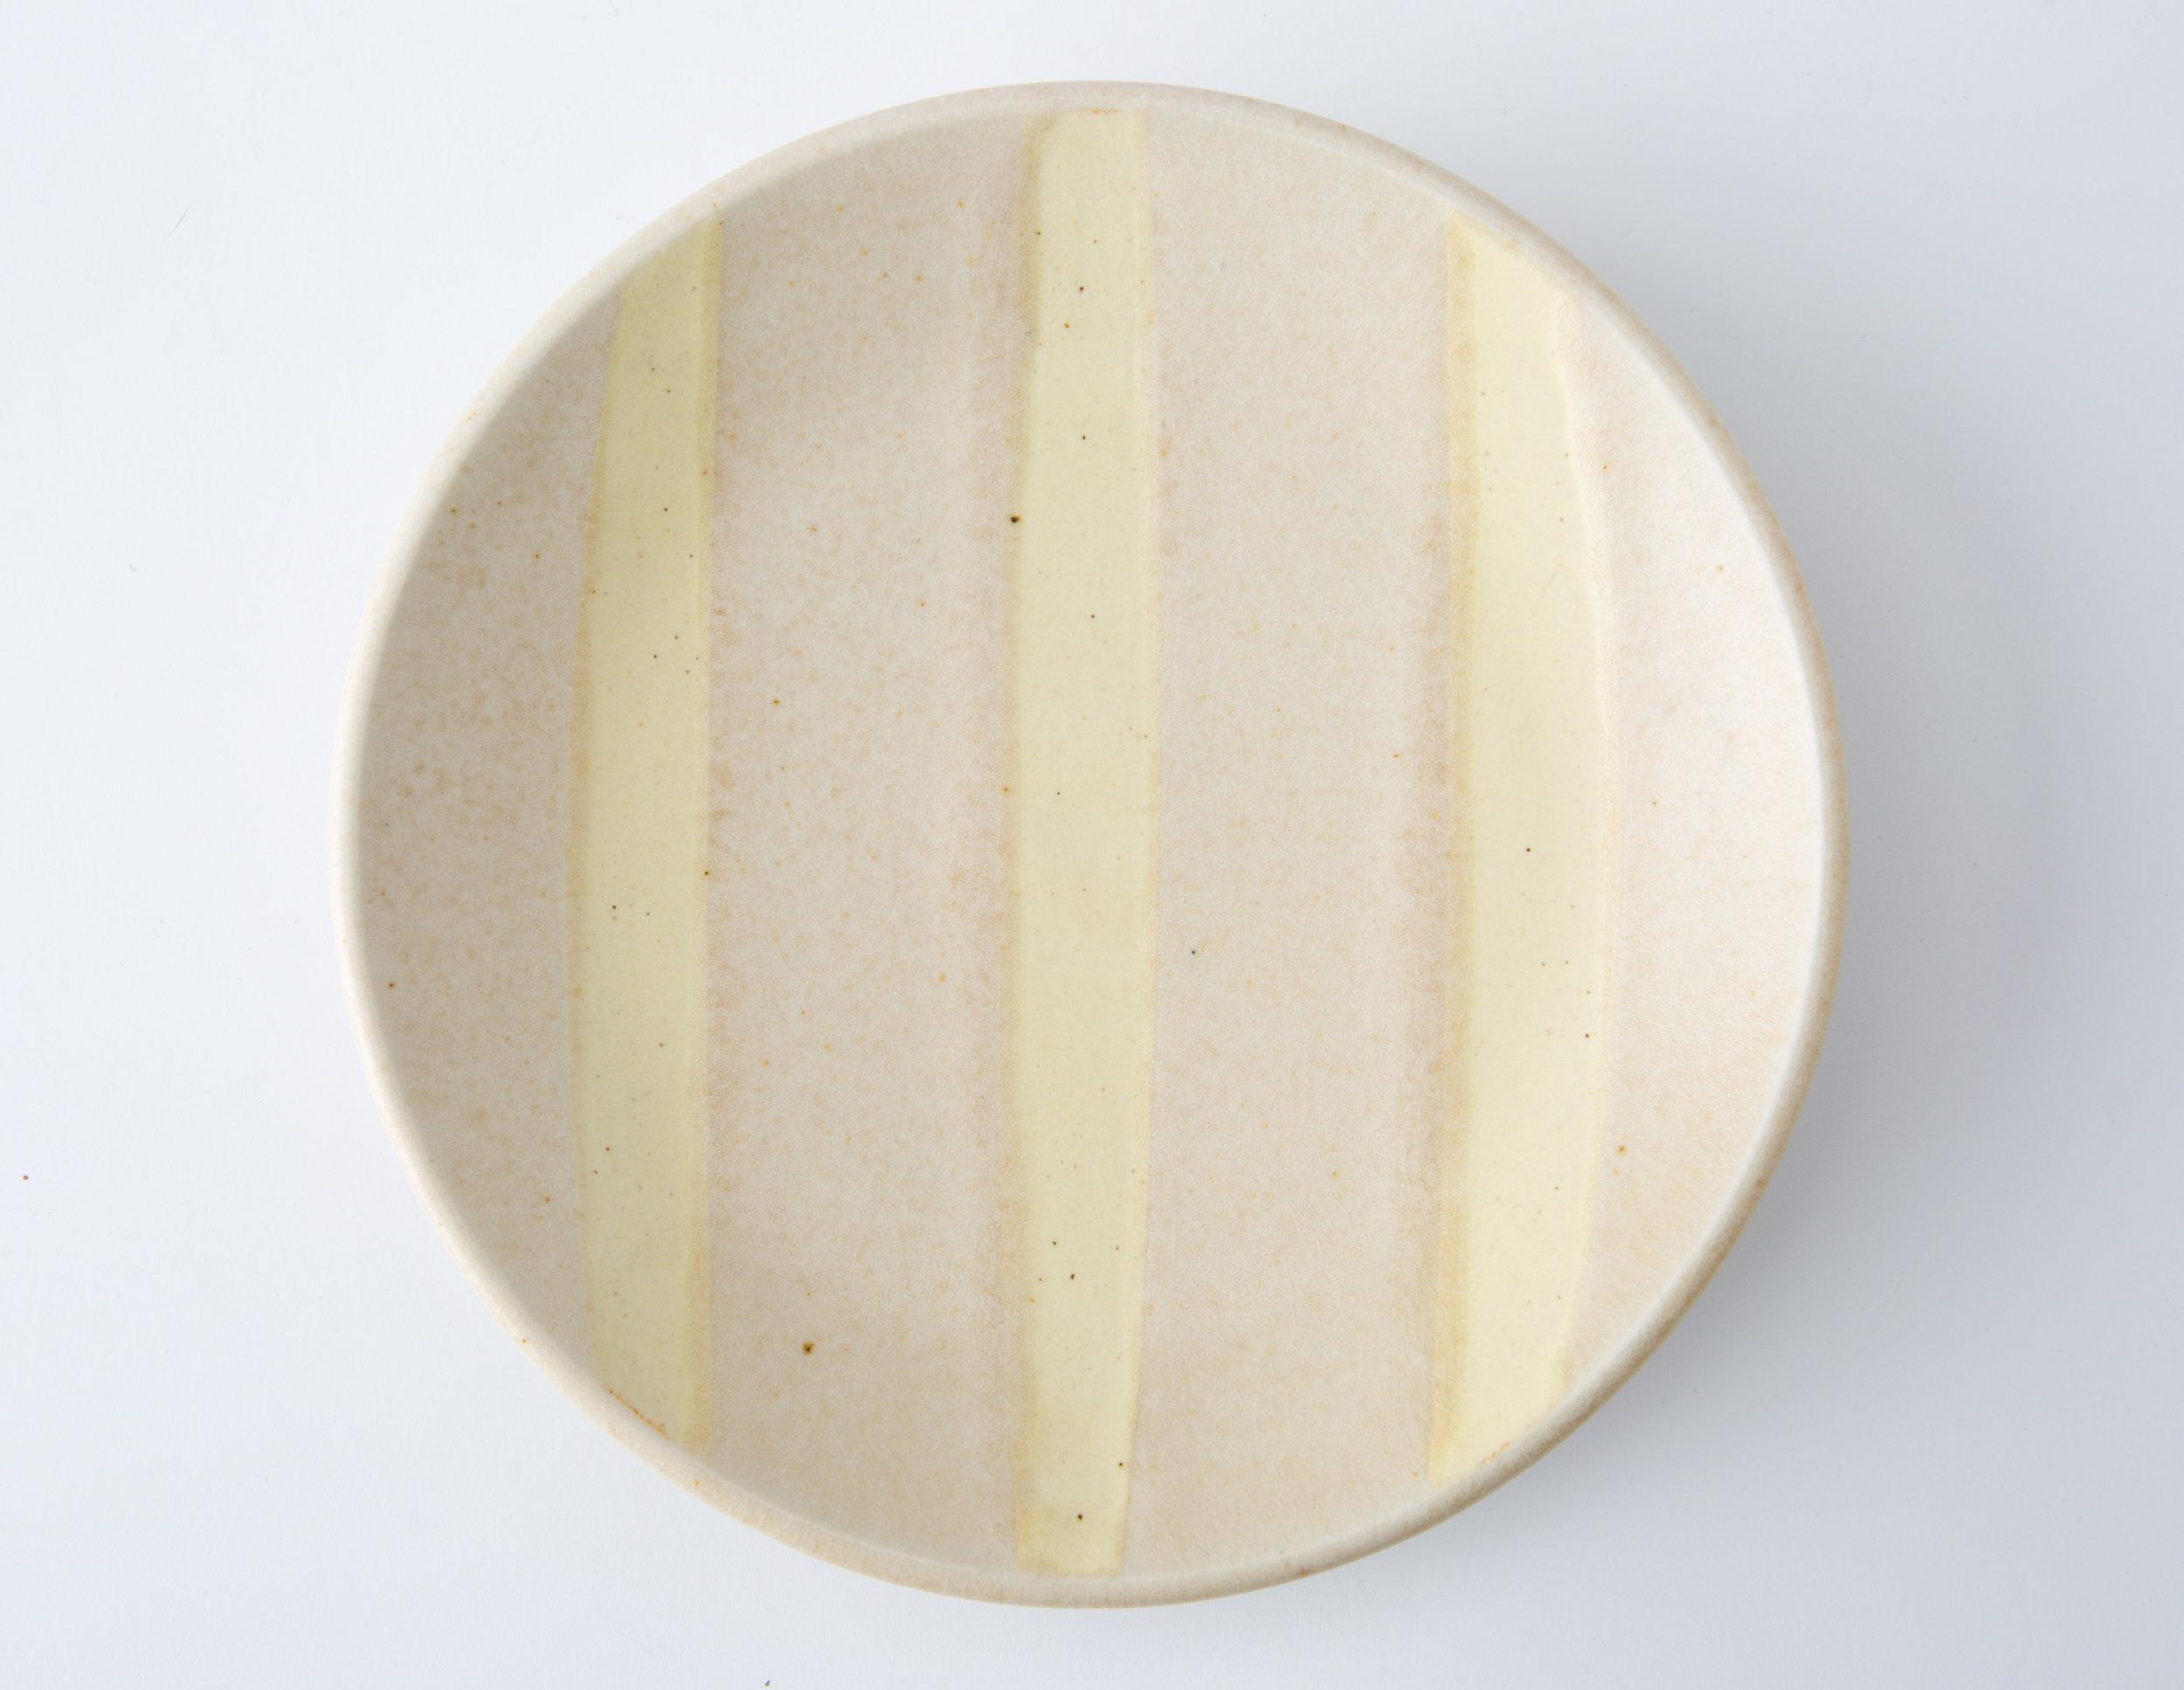 "Bread Plate  Cone 10 Oxidation Porcelain  6.25"" W x 1.75"" H  2016"